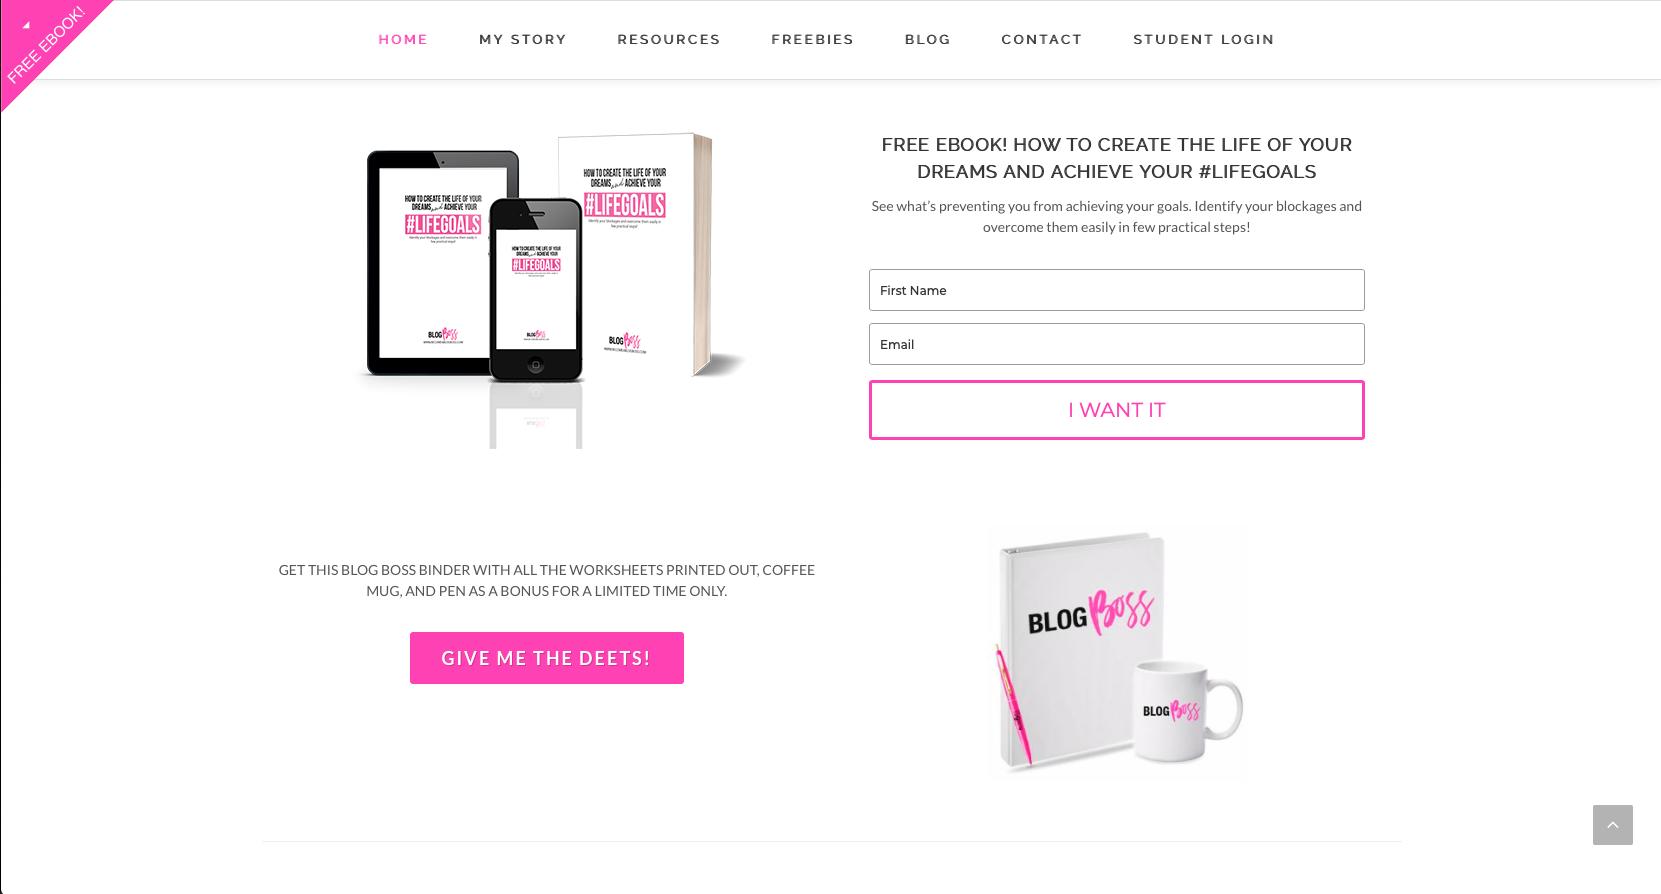 Blog Boss - Embedded Form Example